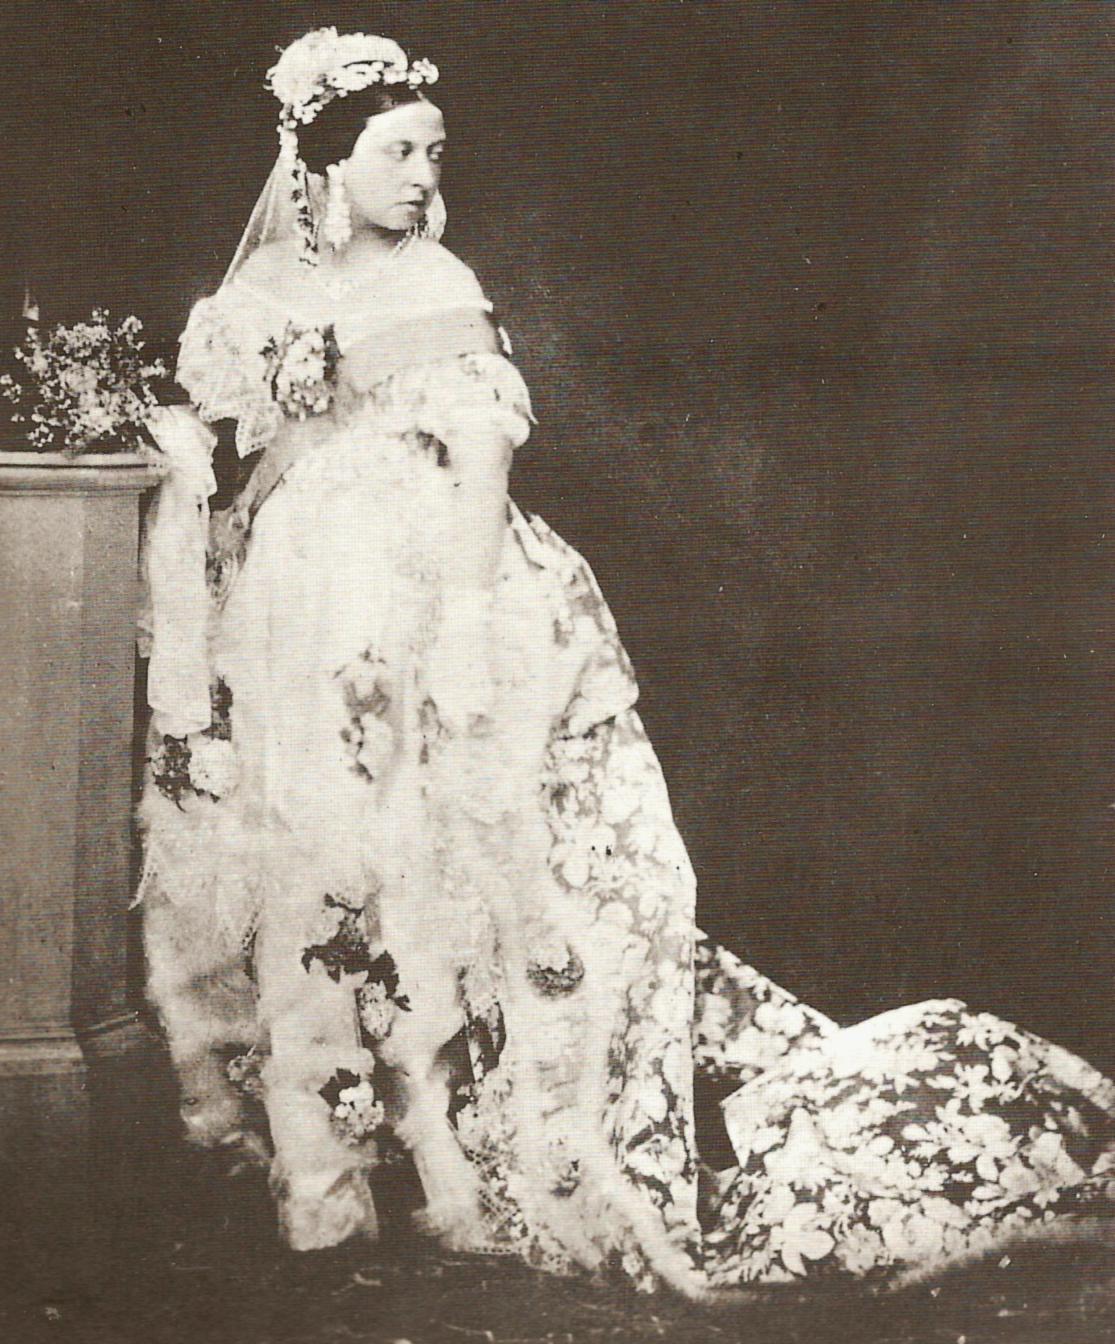 Queen Victoria's White Gown